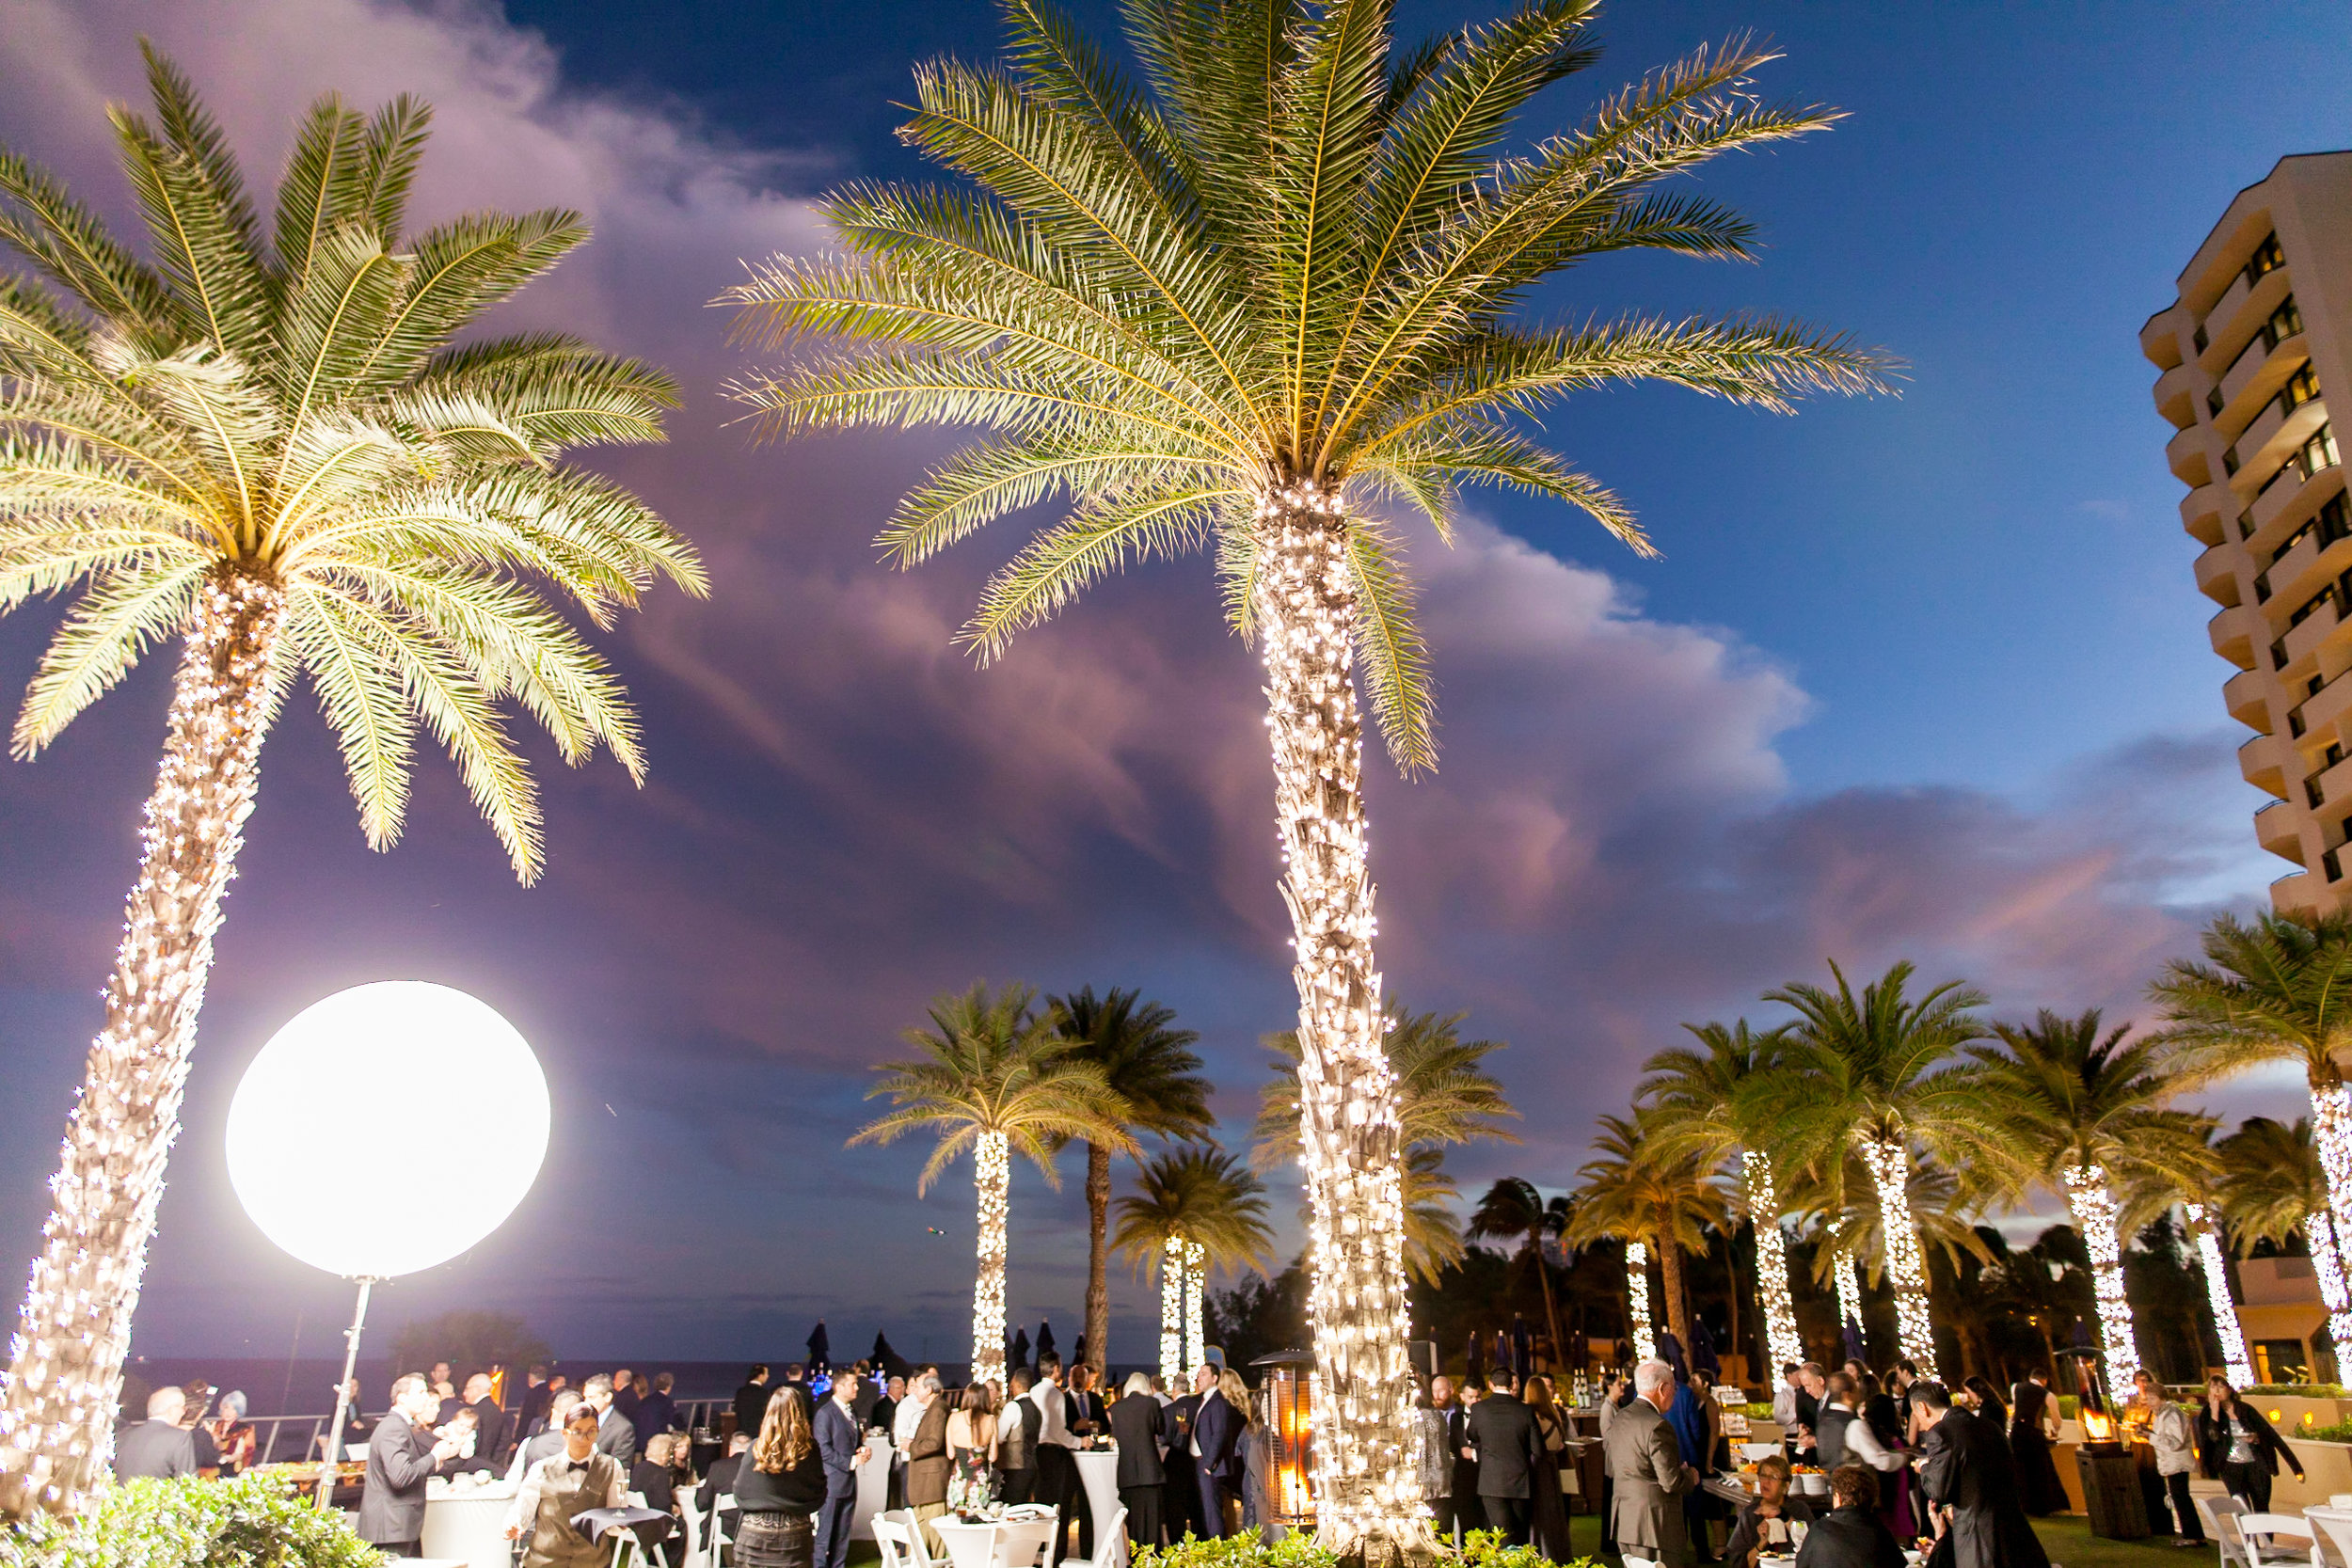 harbor beach marriott ft lauderdale florida wedding by kelilina photography and films-45.jpg